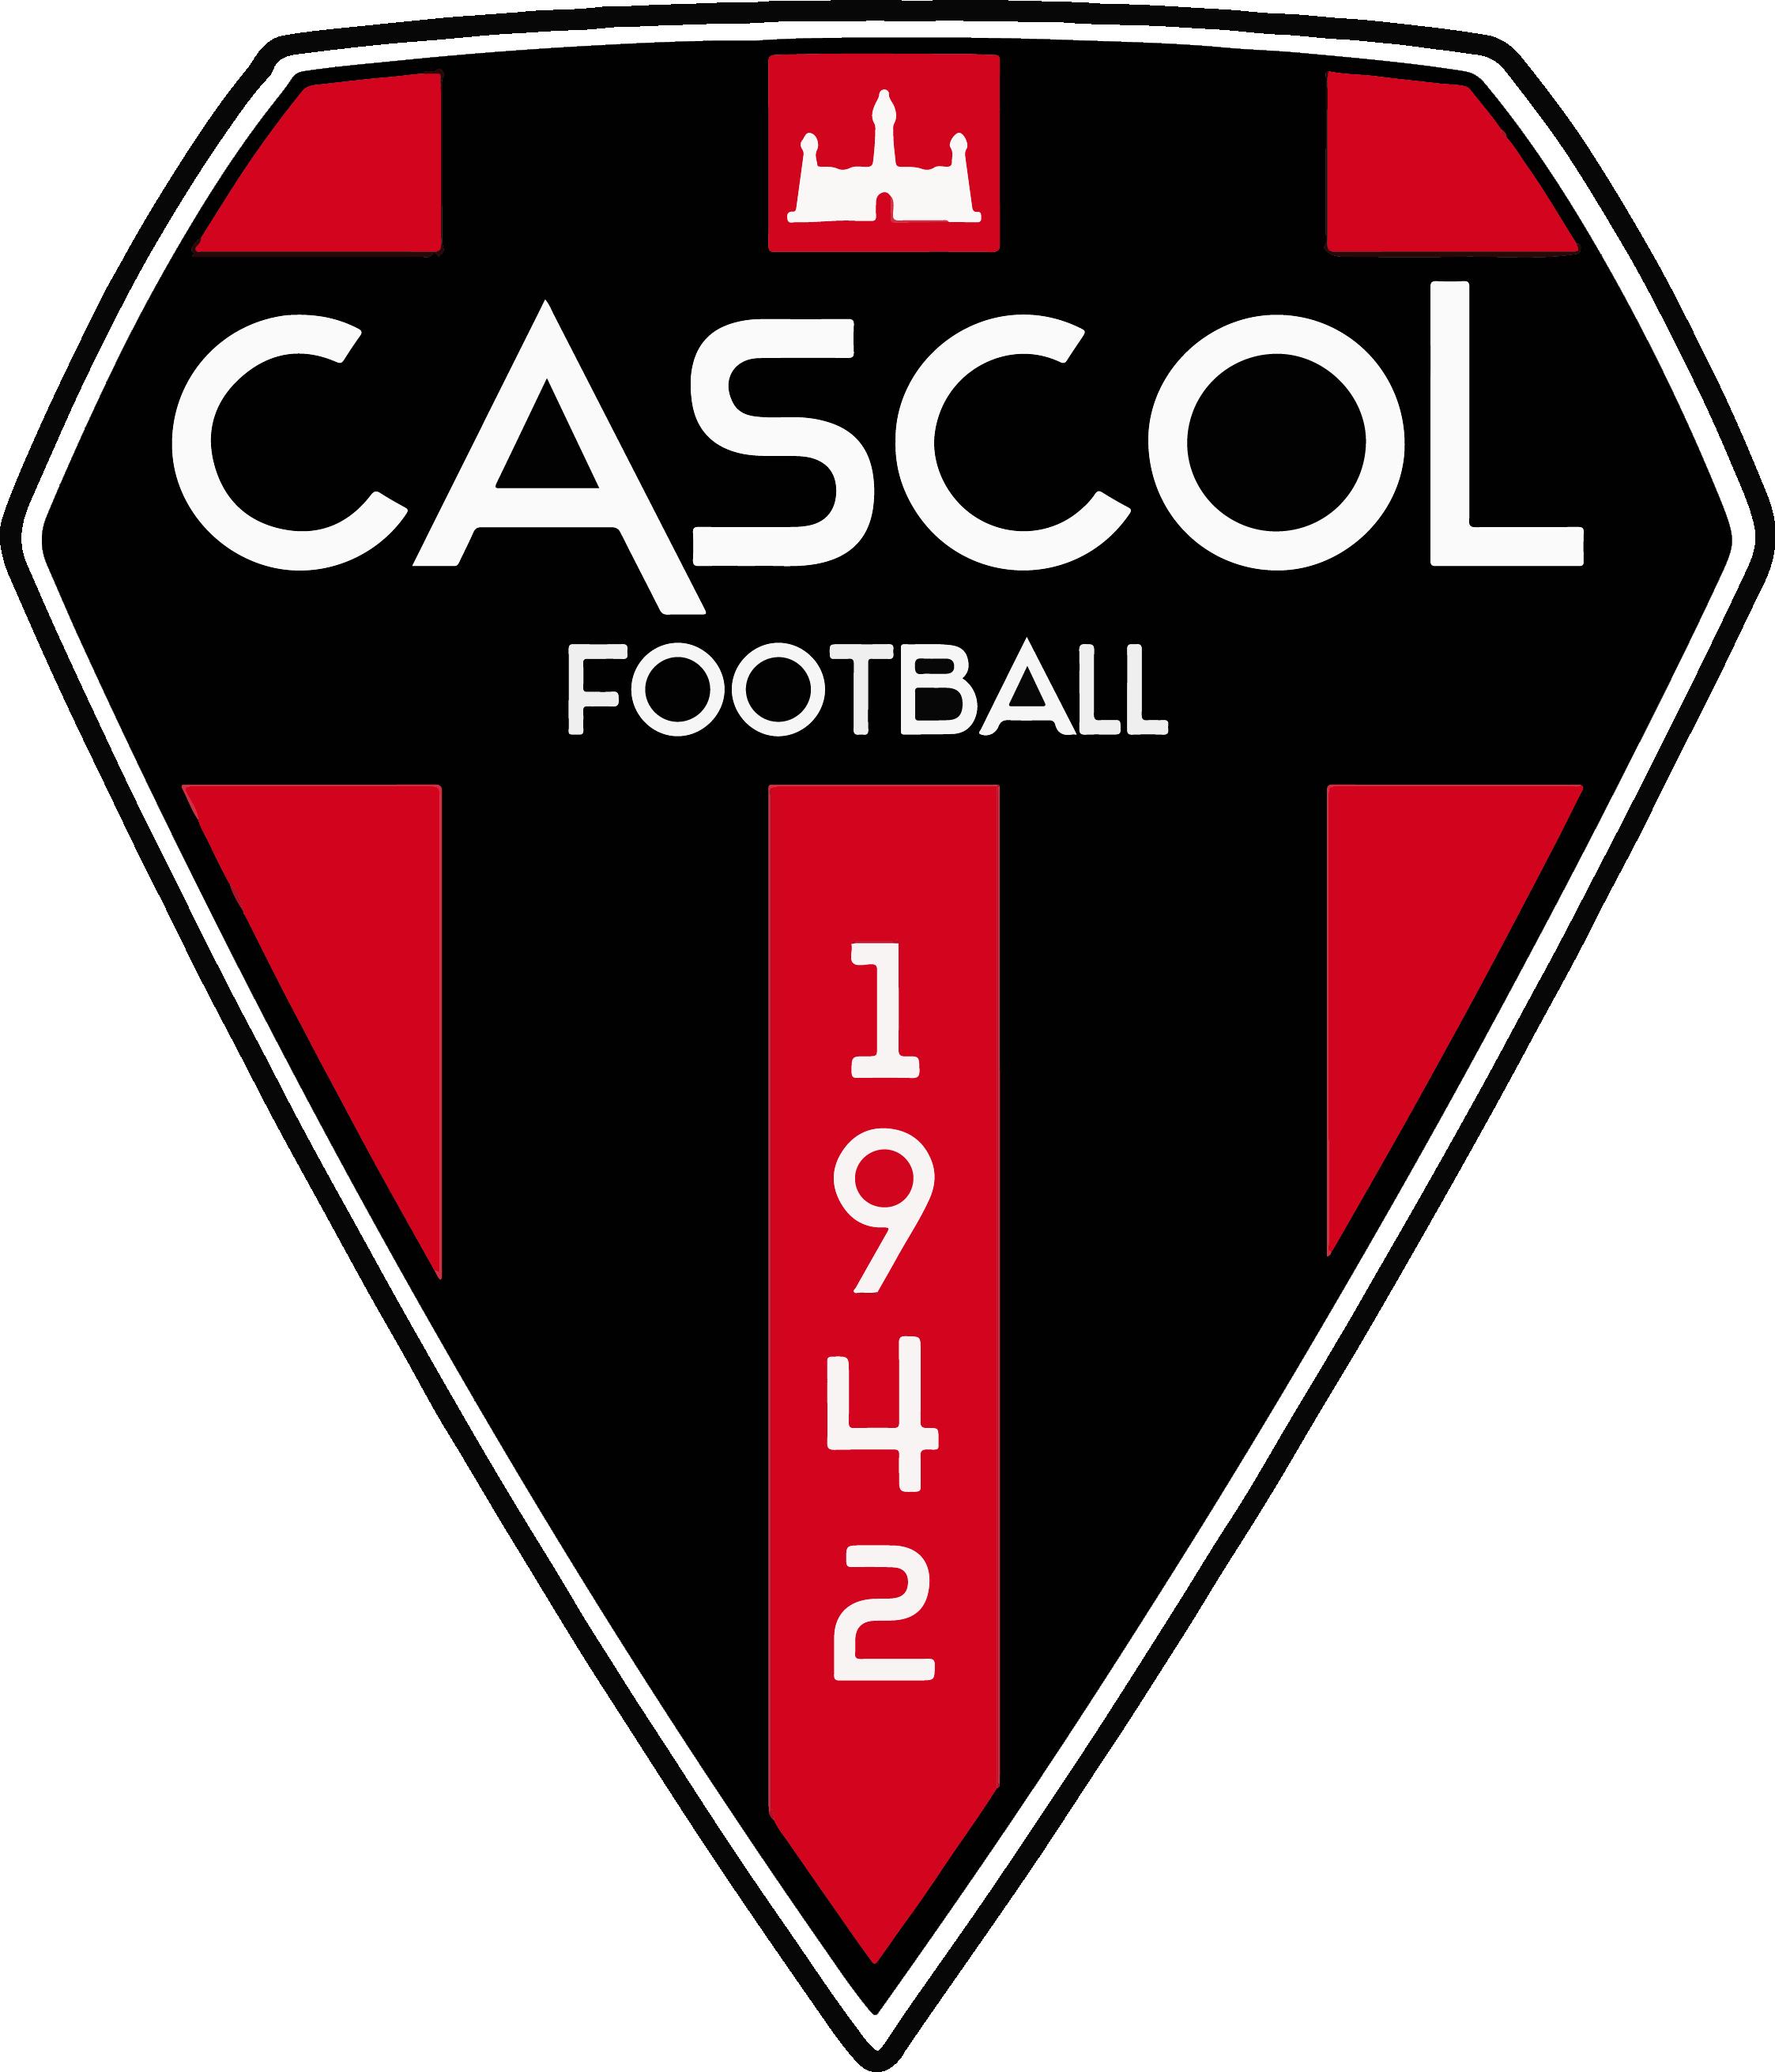 Cascol.png